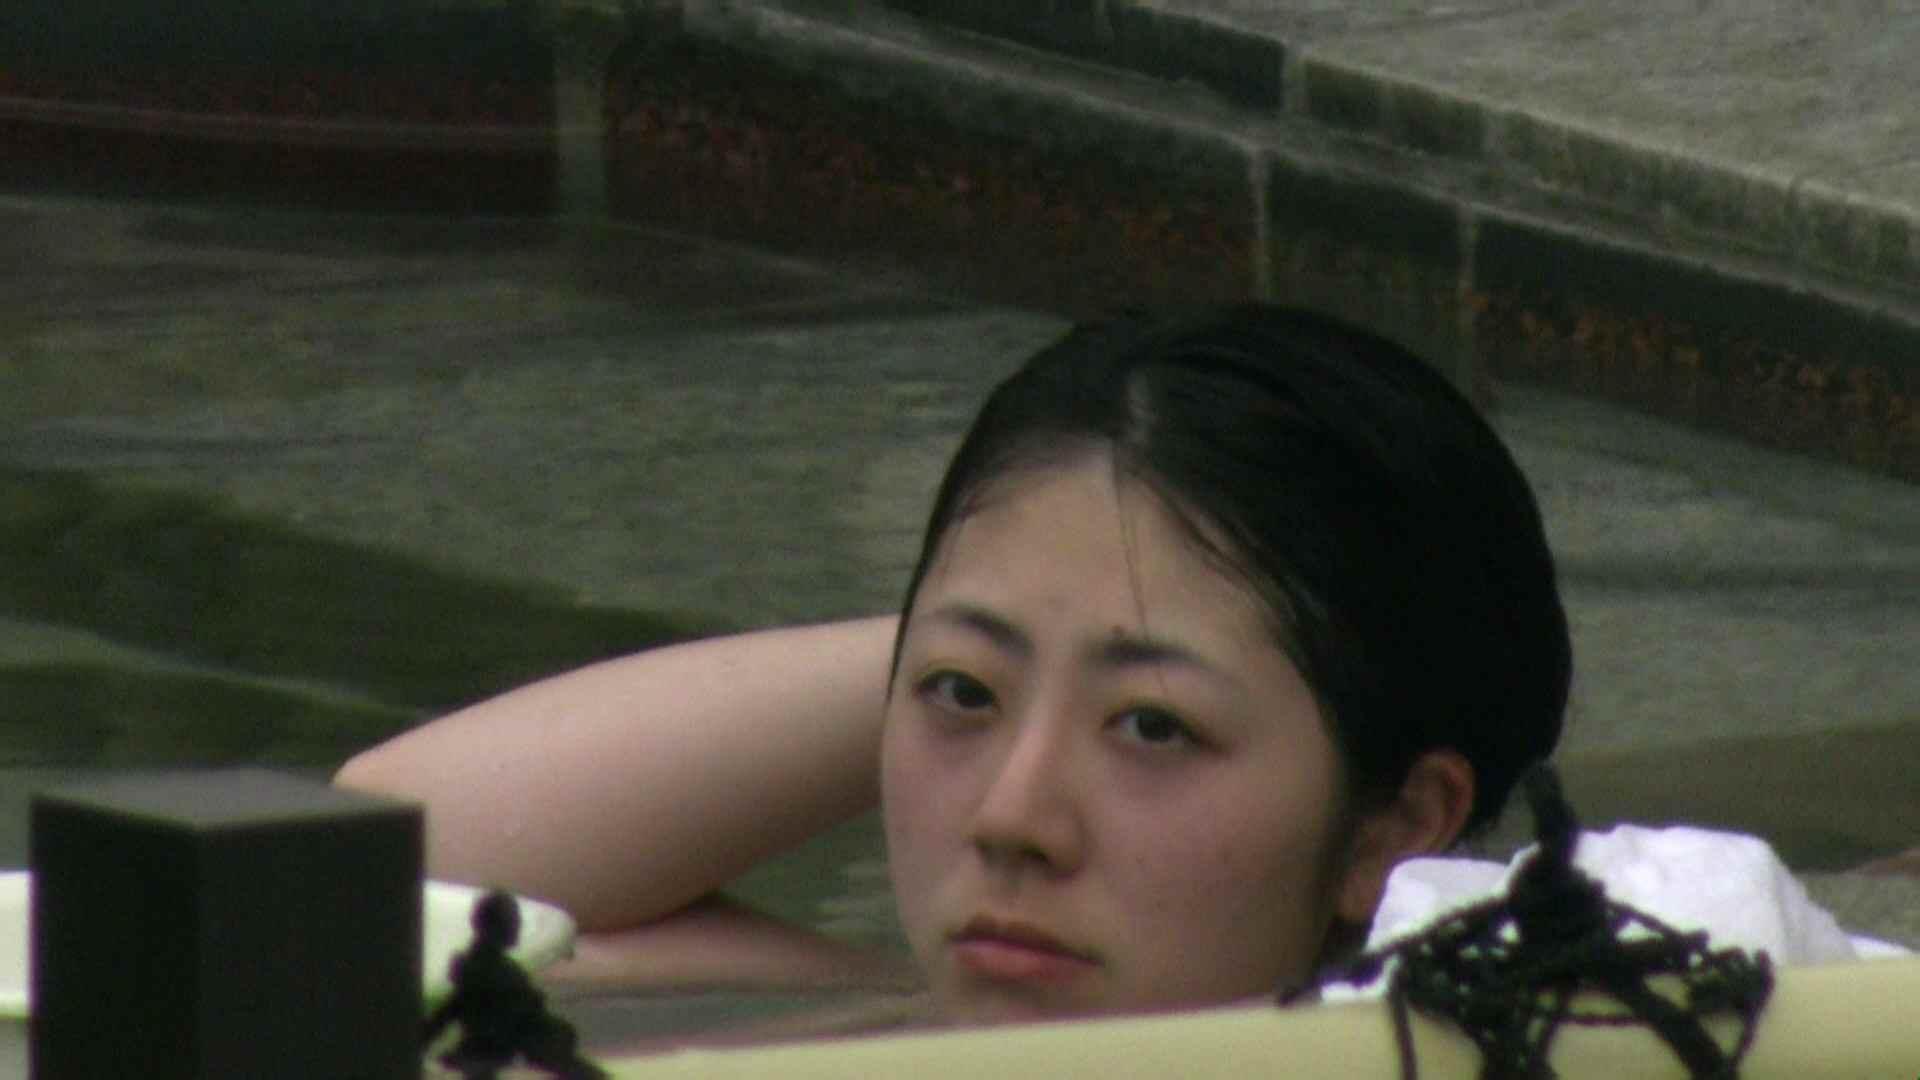 Aquaな露天風呂Vol.04 露天風呂編 | 盗撮シリーズ  94PIX 11